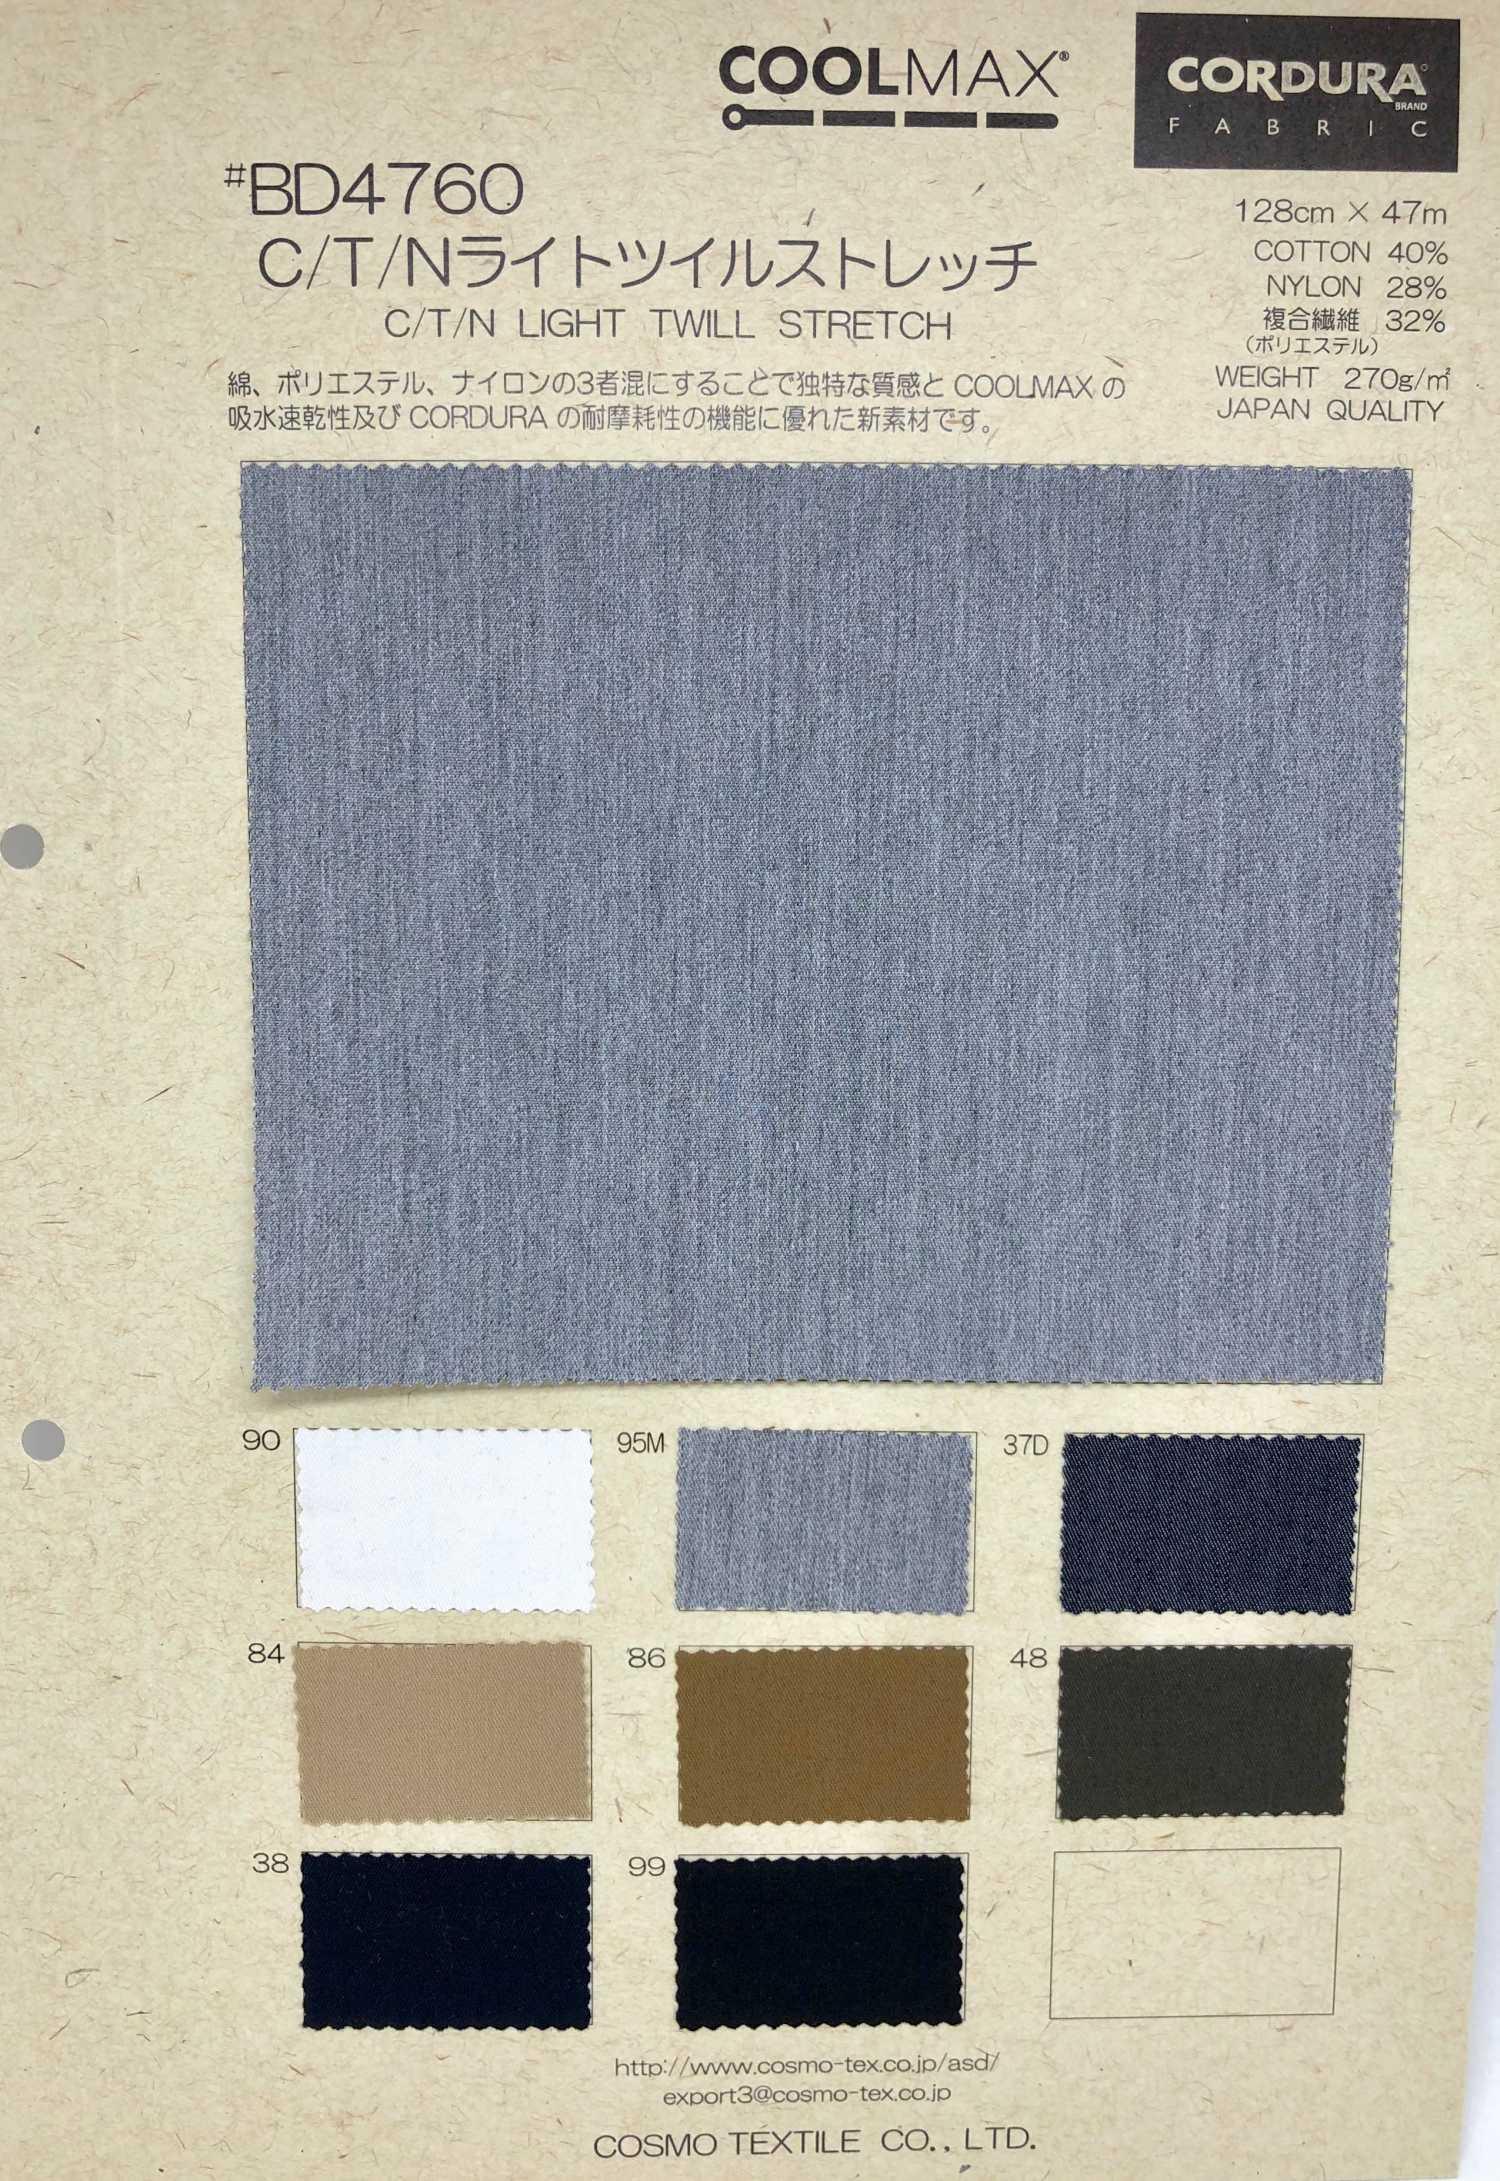 BD4760 COOLMAX C/T/Nライトストレッチツイル[生地] コスモテキスタイル/オークラ商事 - ApparelX アパレル資材卸通販